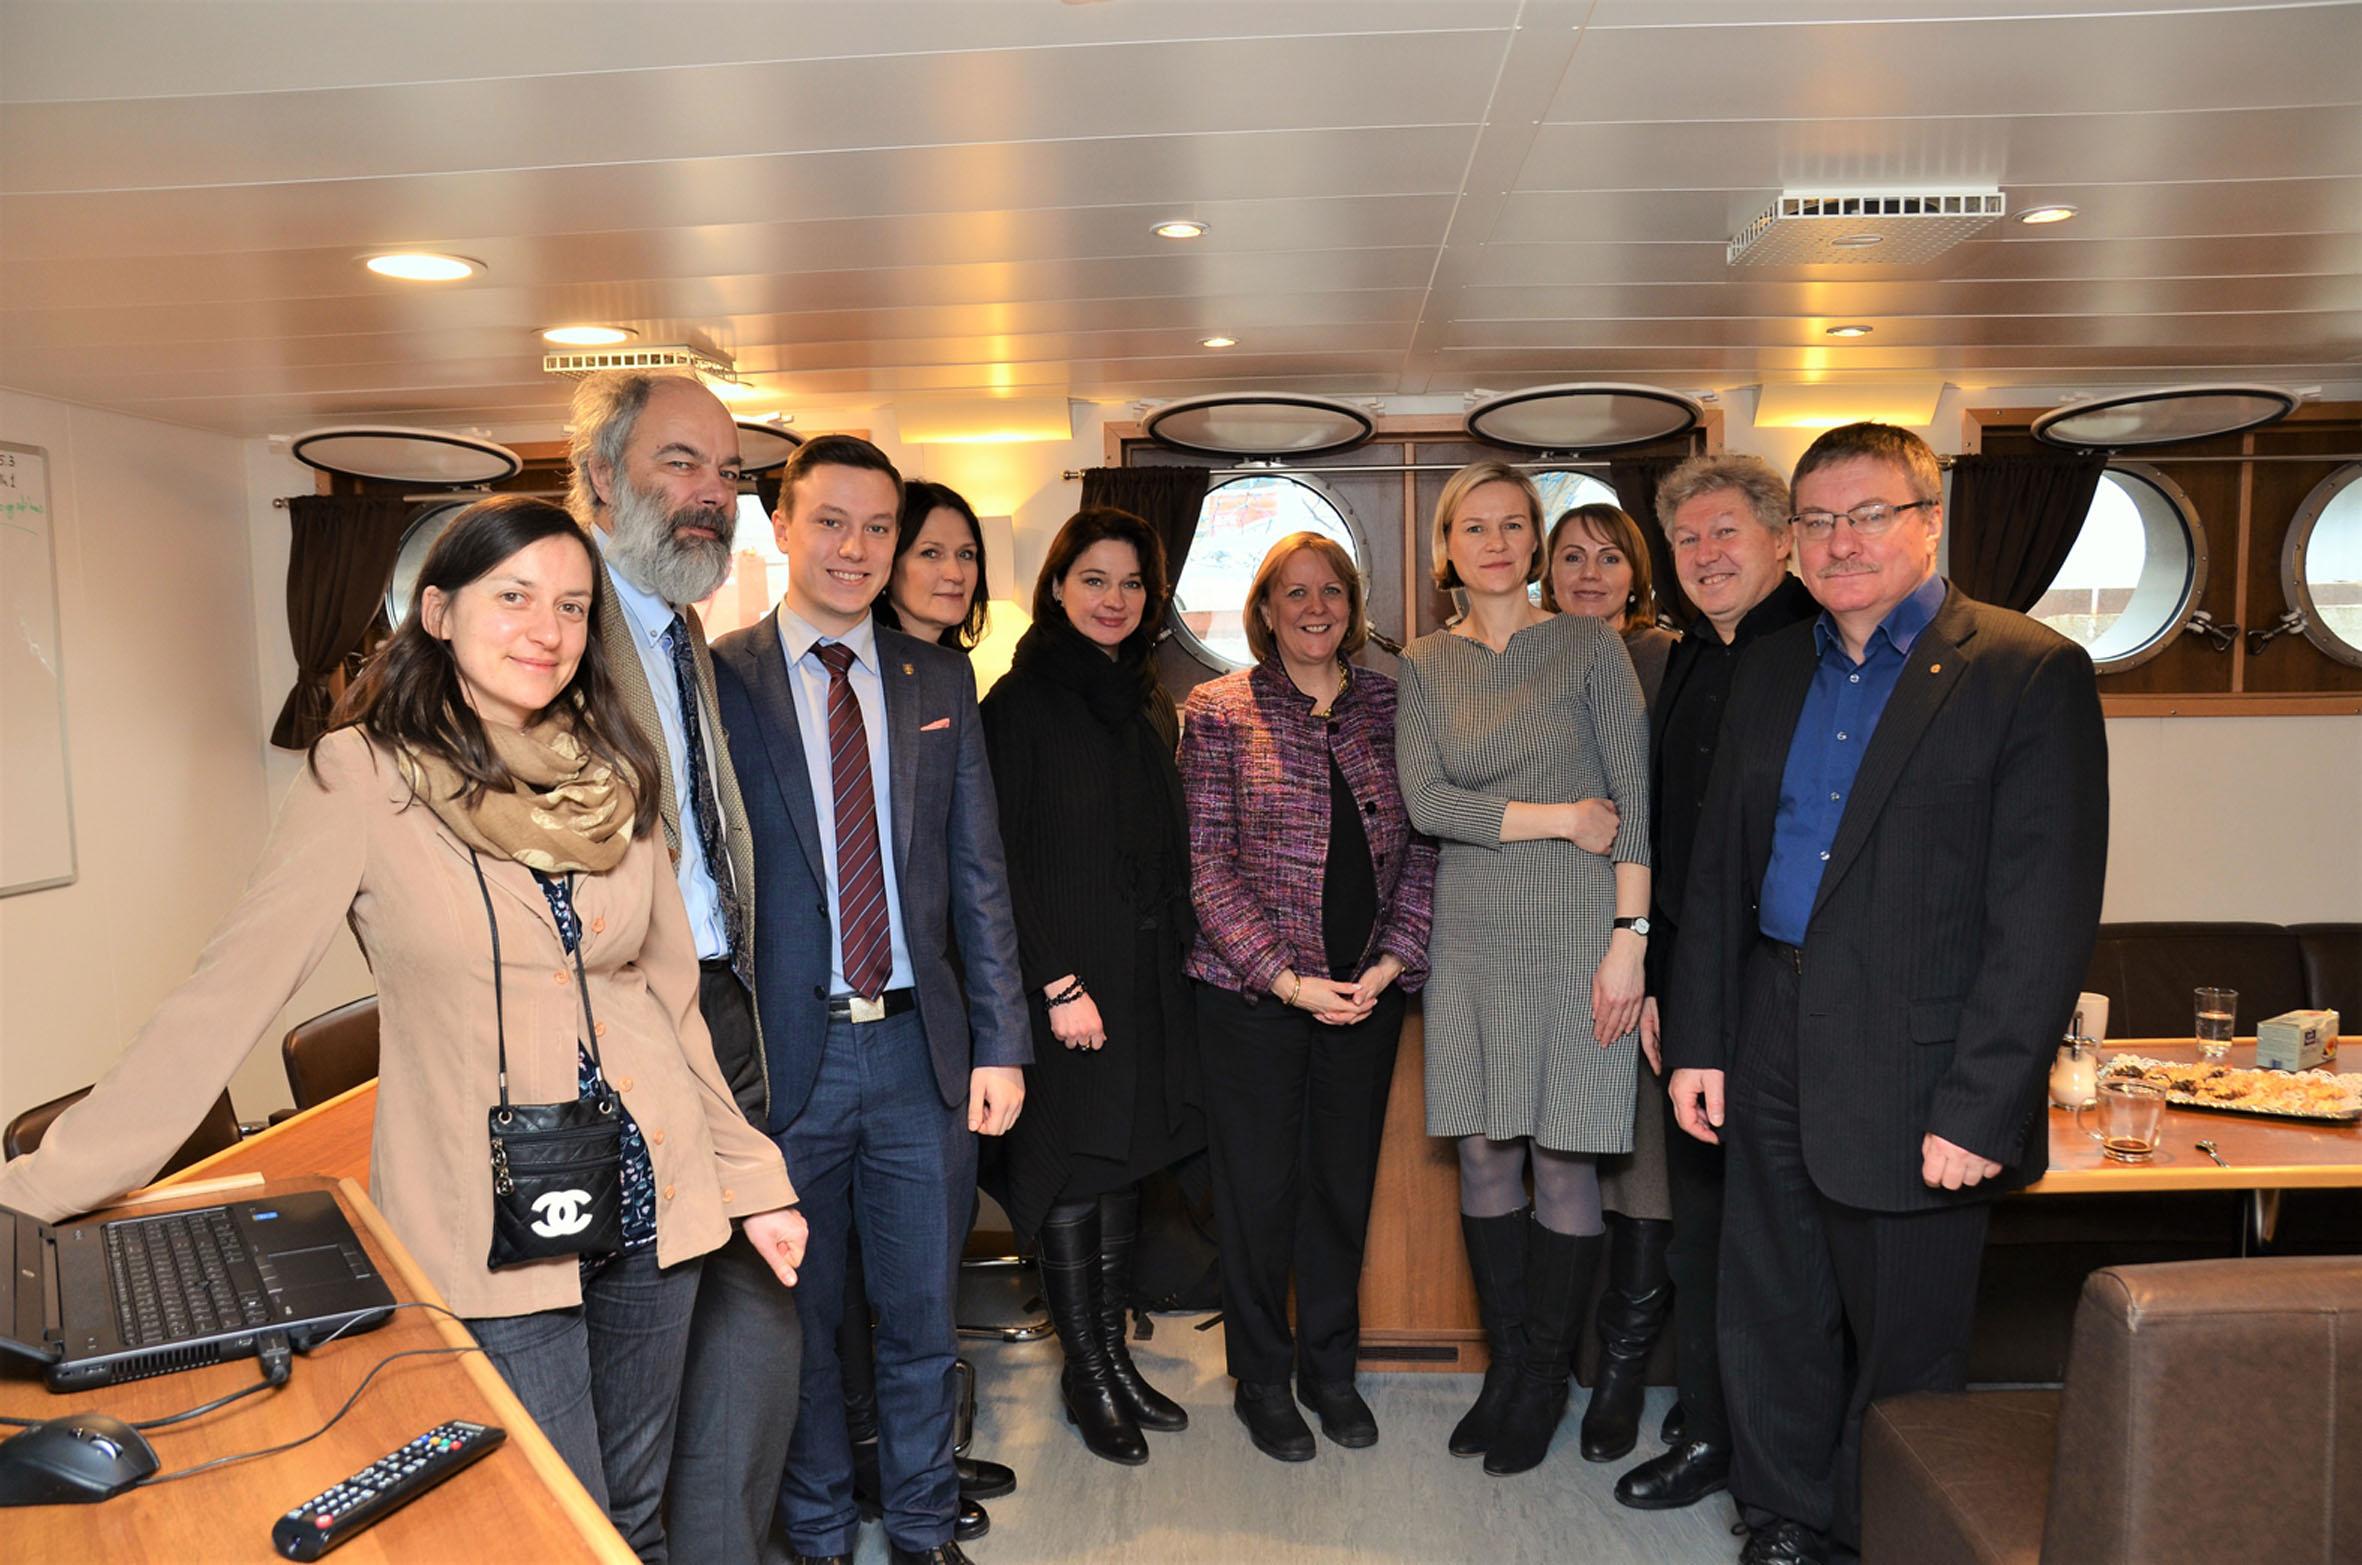 JAV ambasadore Ane Hol susitikime laive_ku.lt